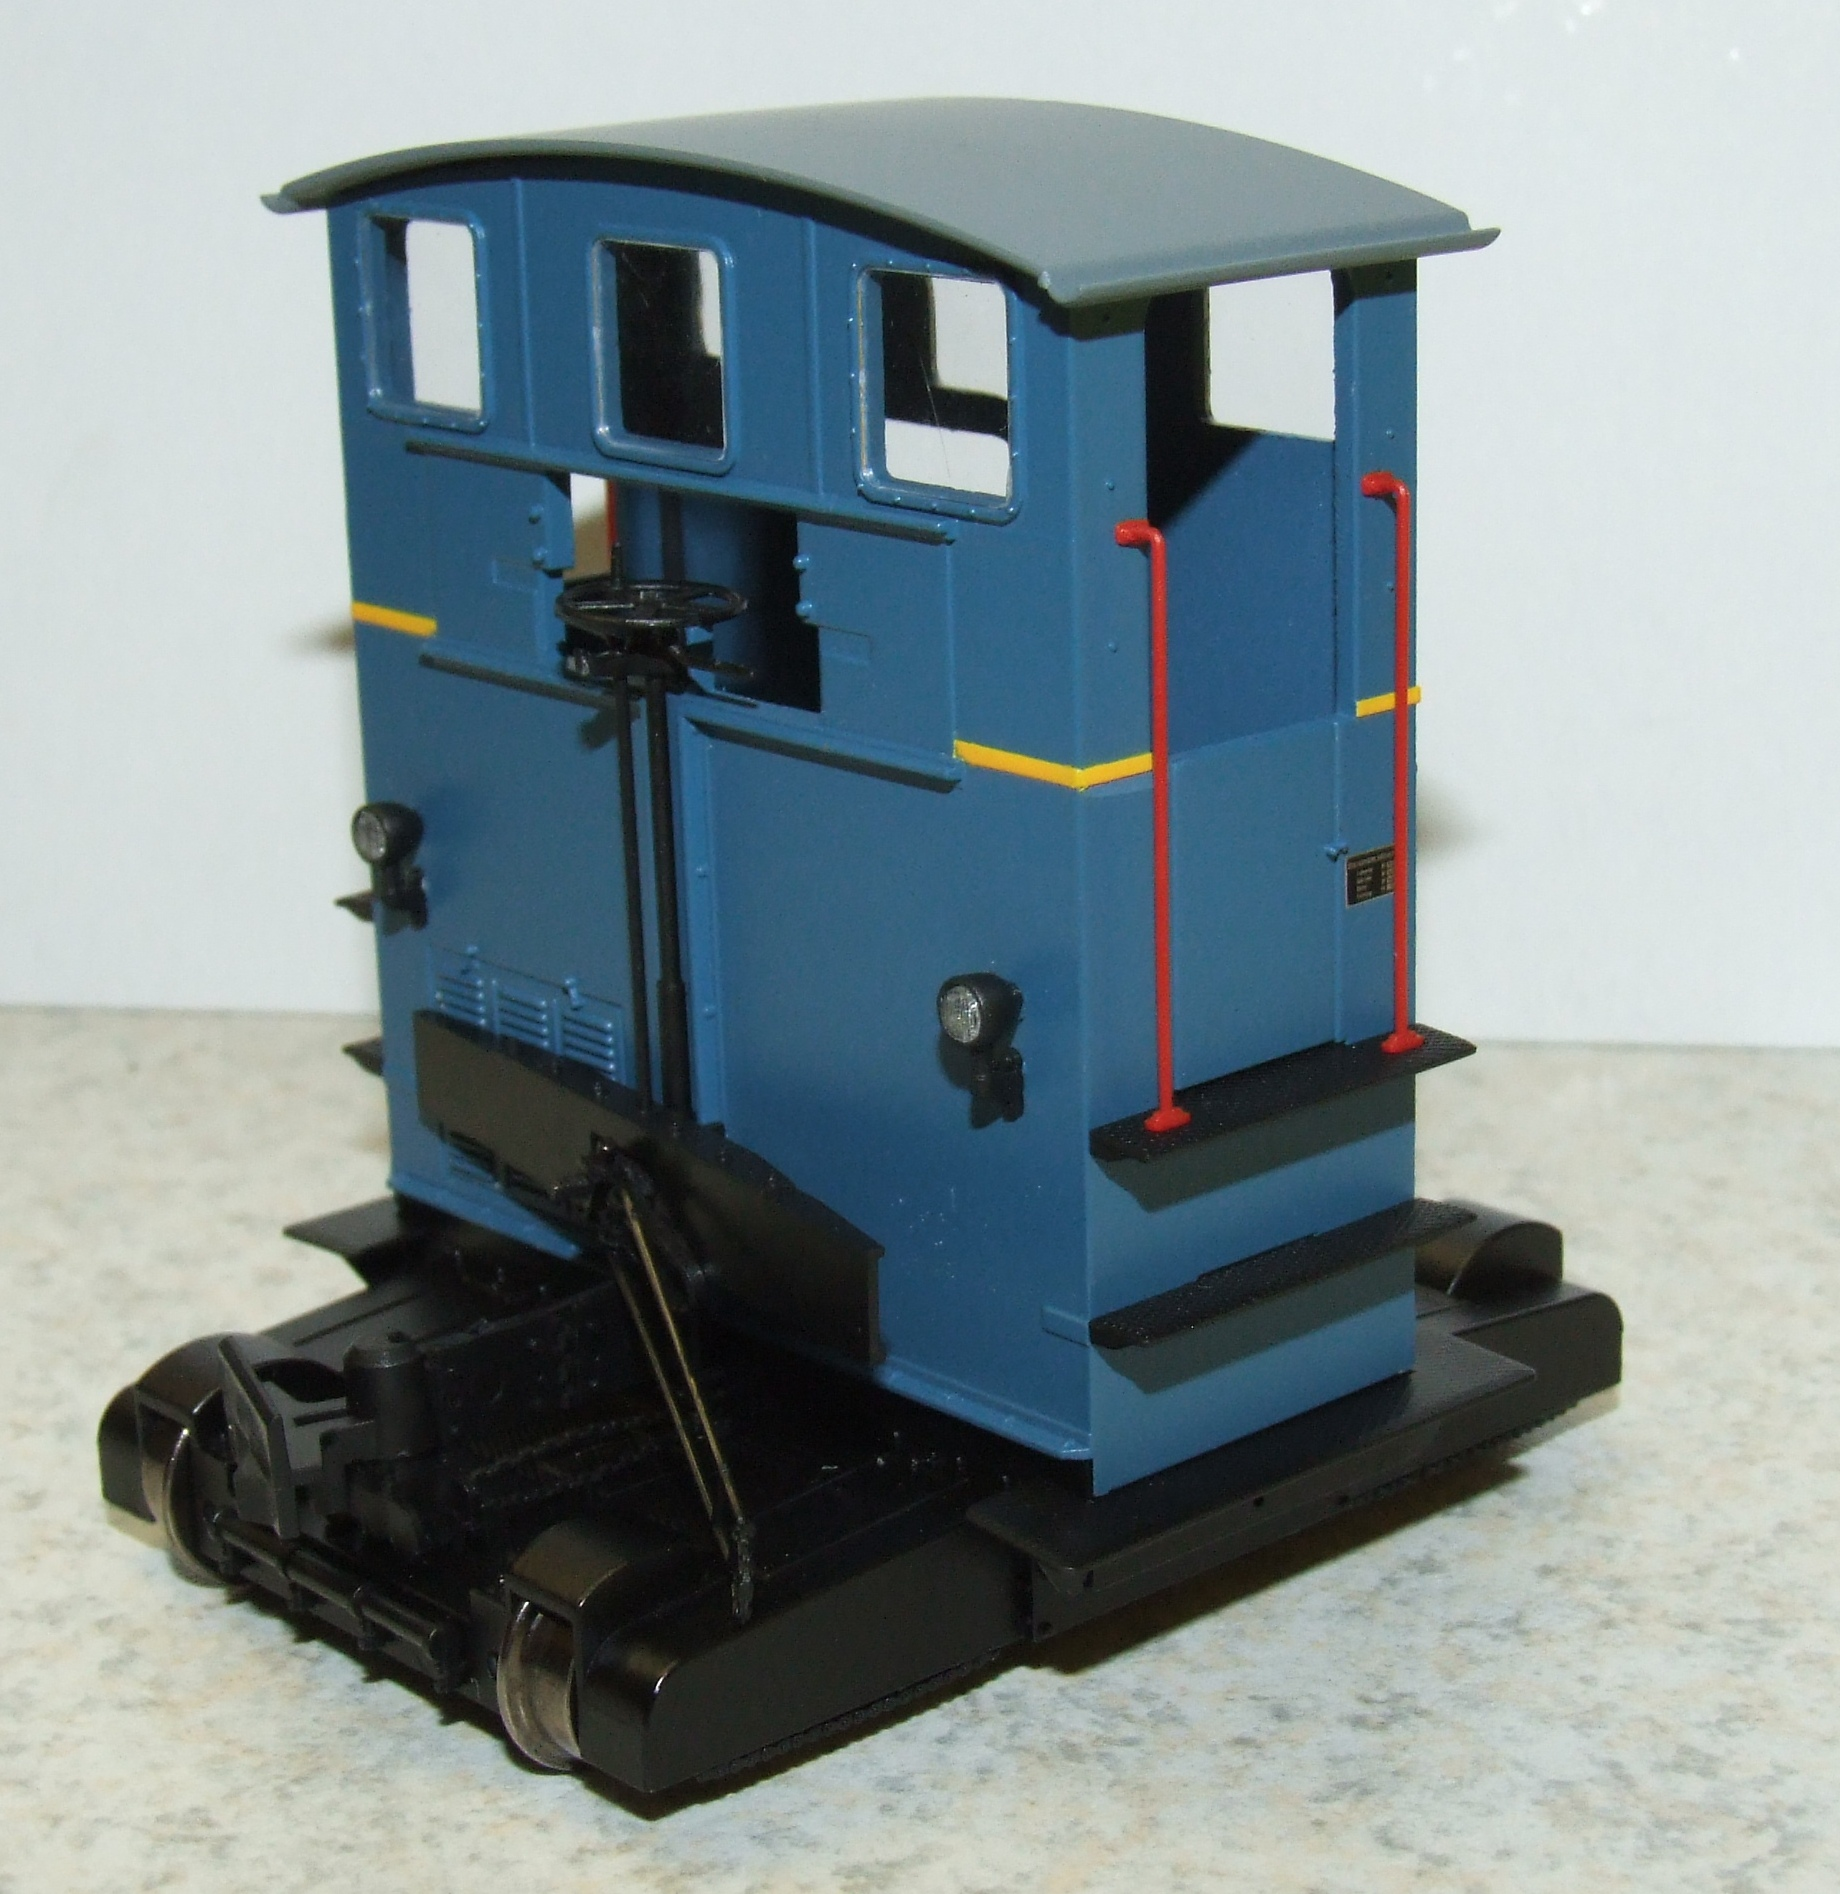 BRAWA 31001 Spur 0 Breuer Rangiertraktor Lokomotor blau III